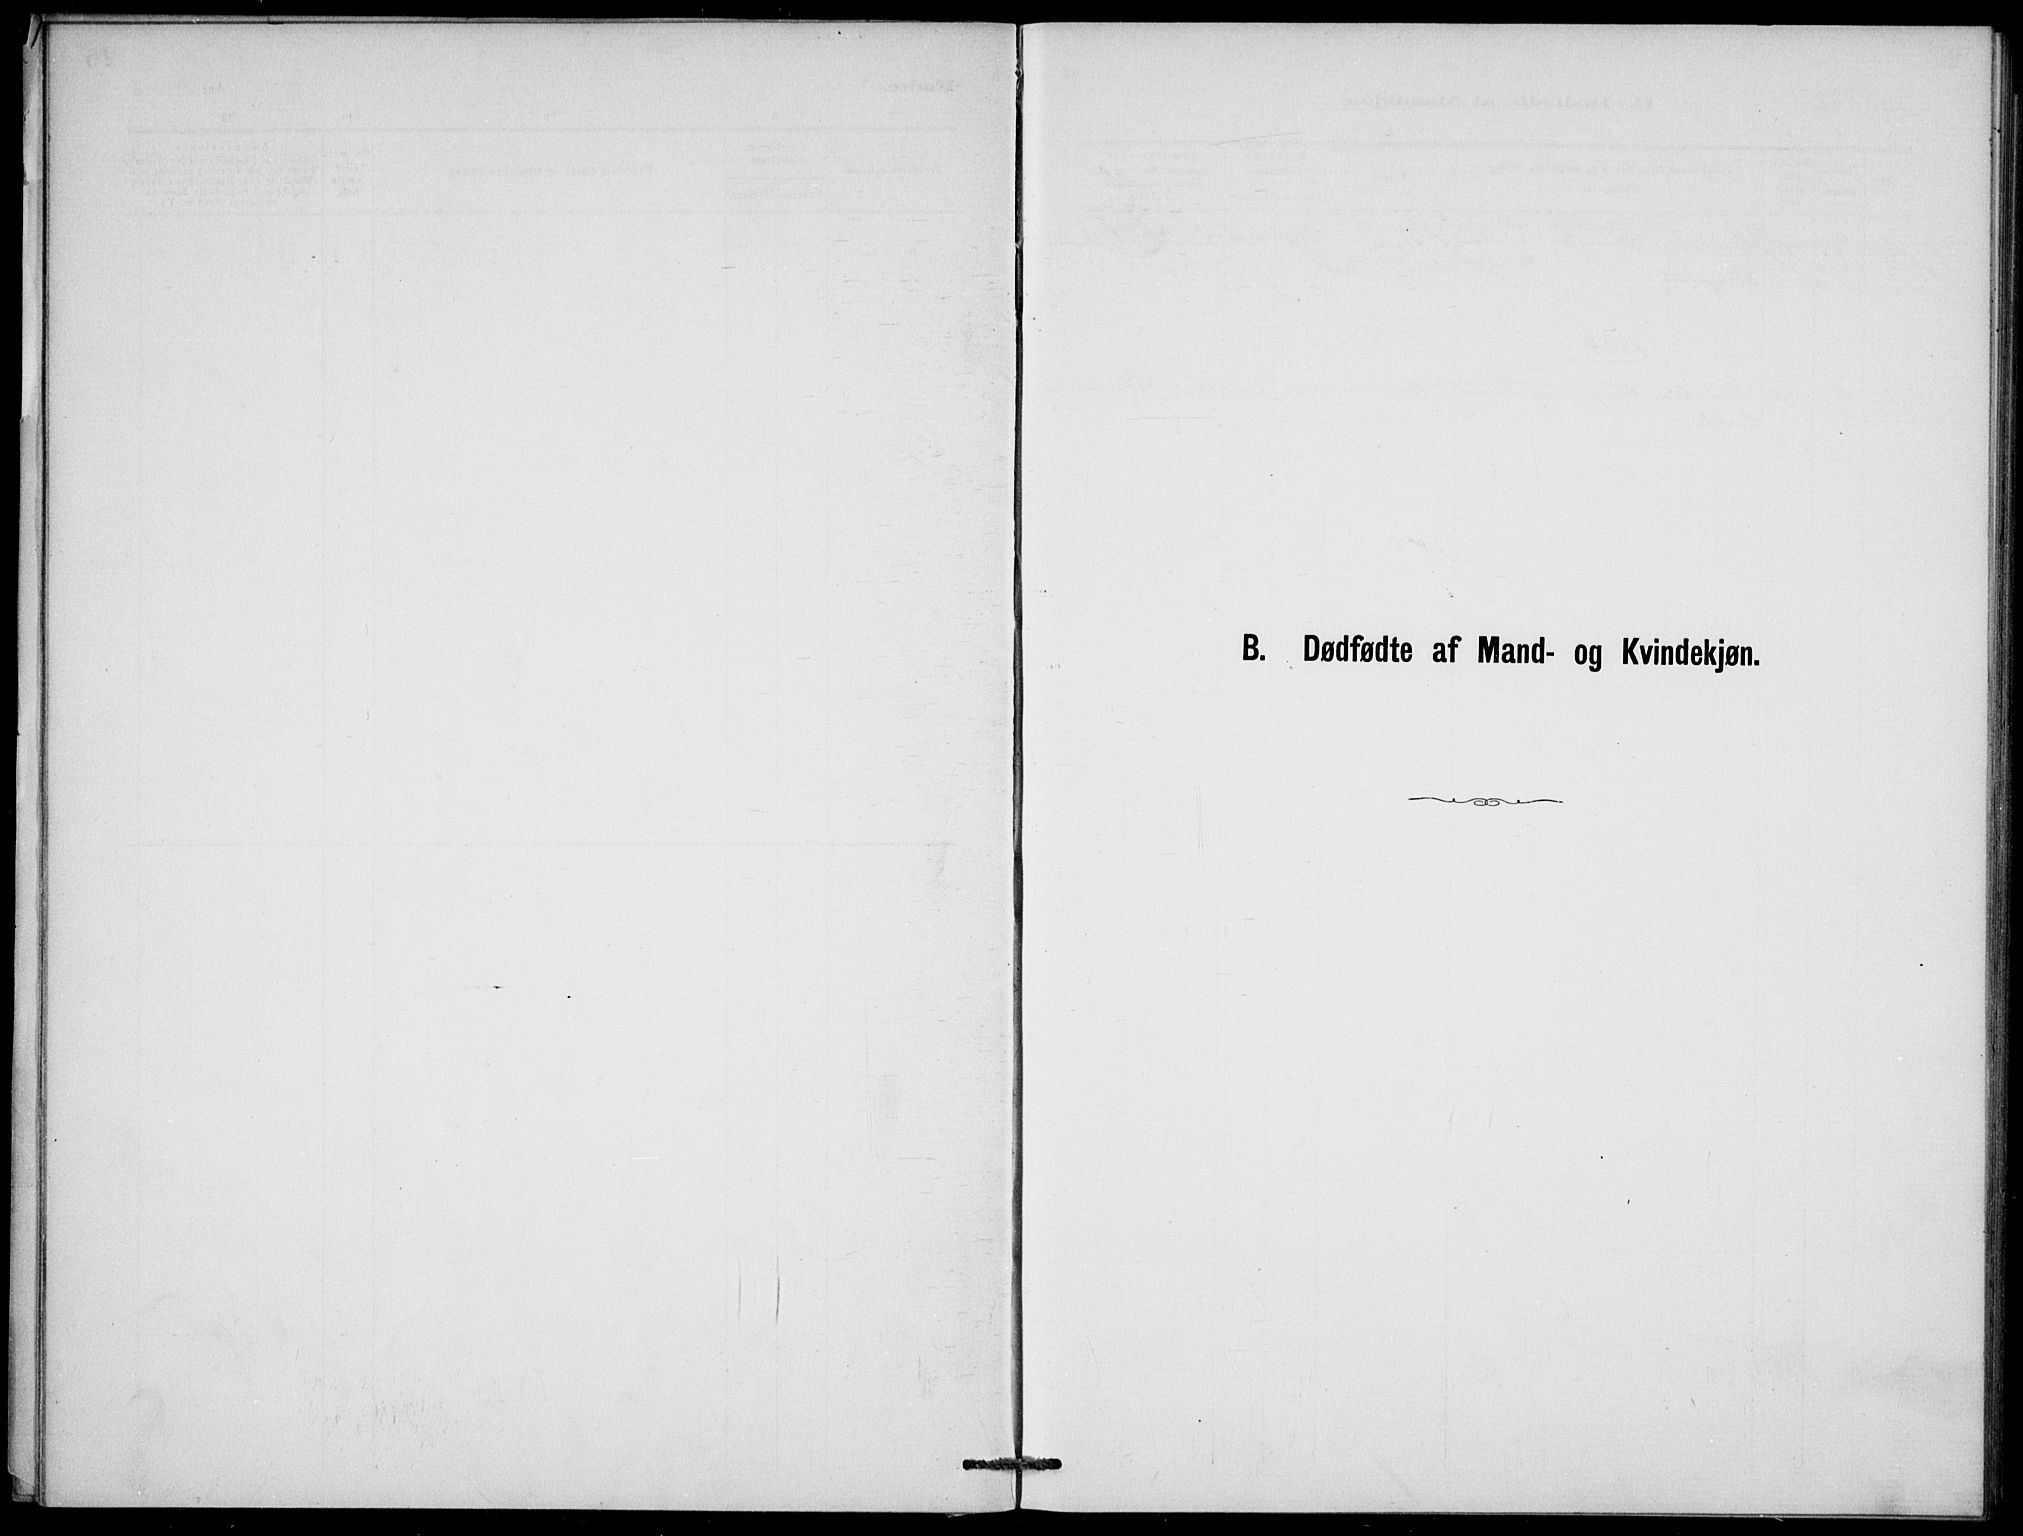 SAKO, Lunde kirkebøker, F/Fb/L0003: Ministerialbok nr. II 3, 1882-1891